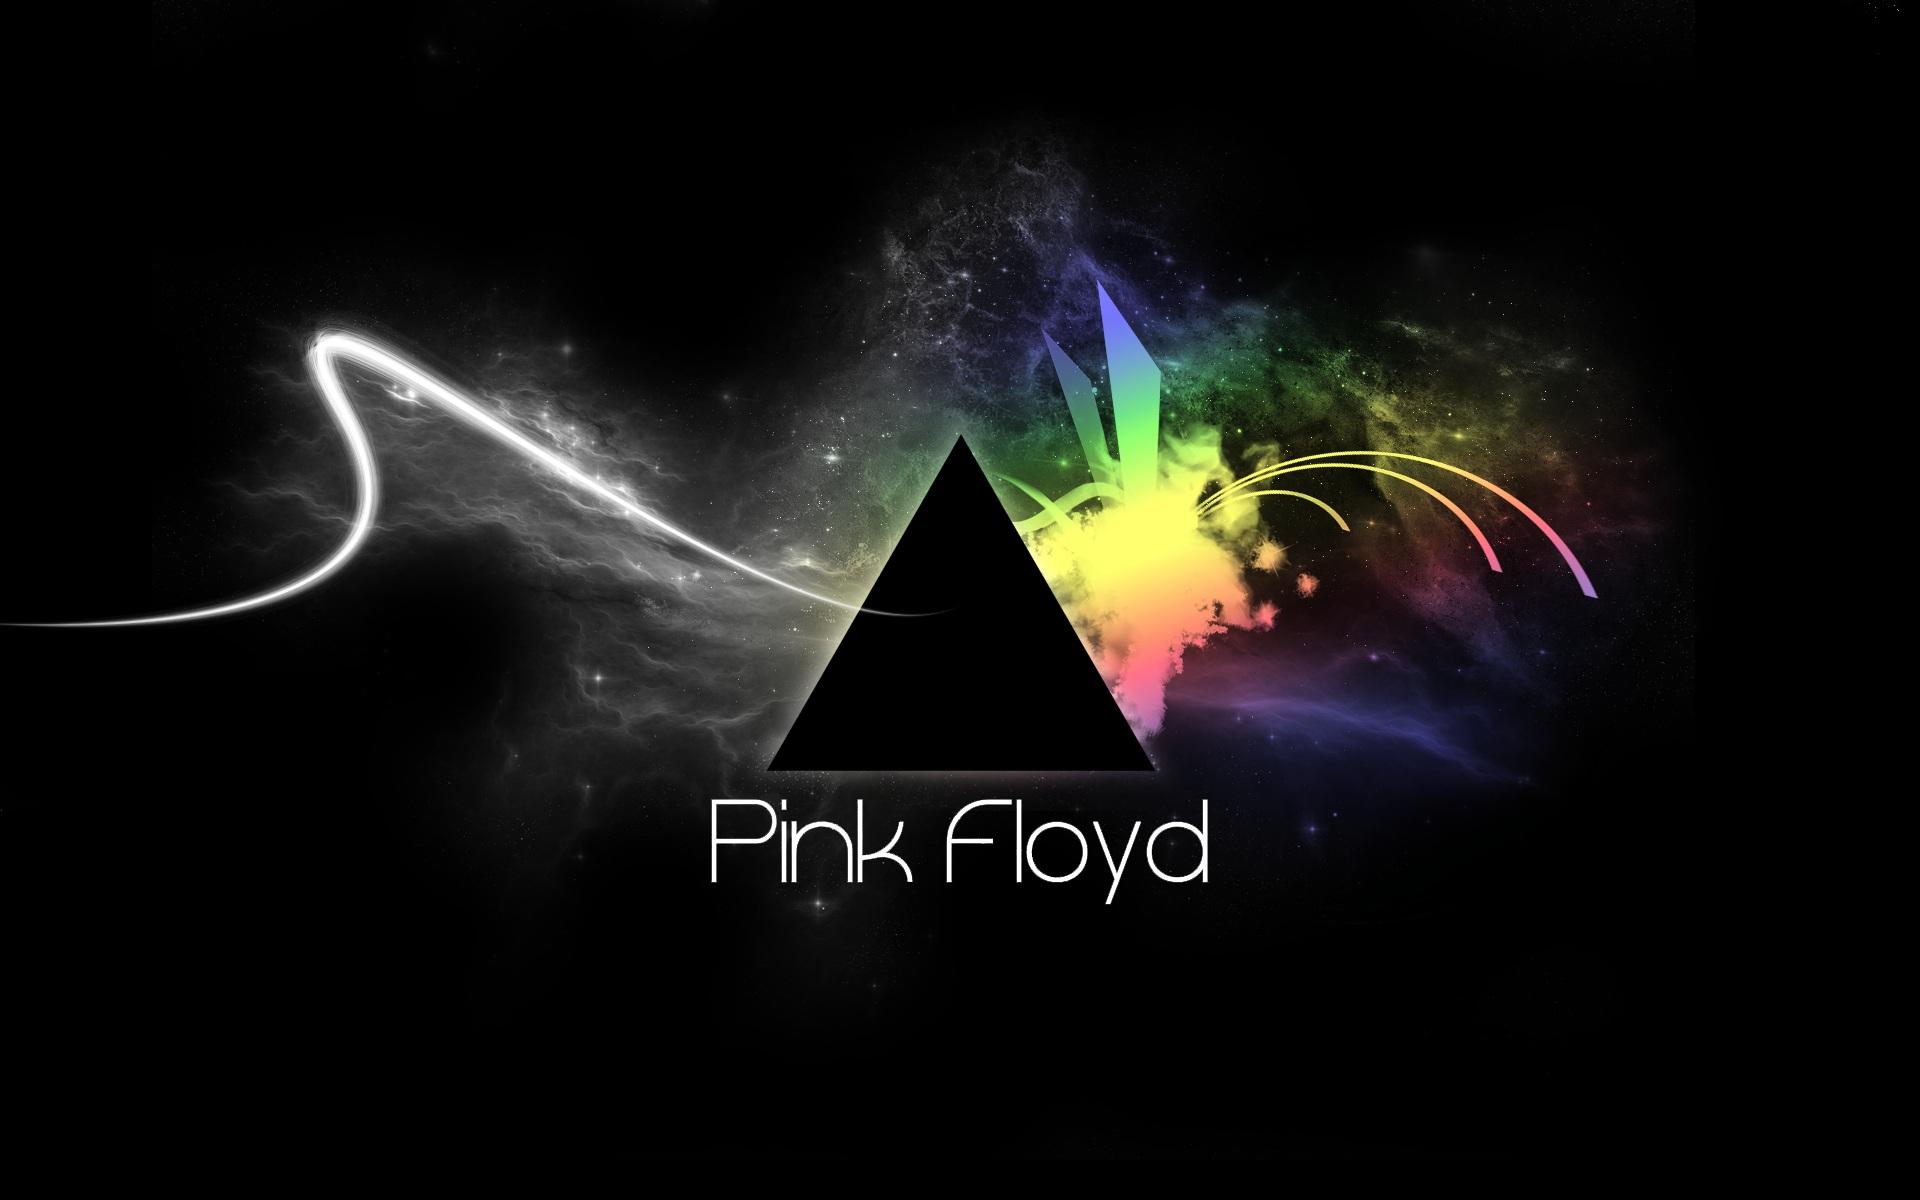 Download Pink Floyd HD Wallpaper 1920x1200